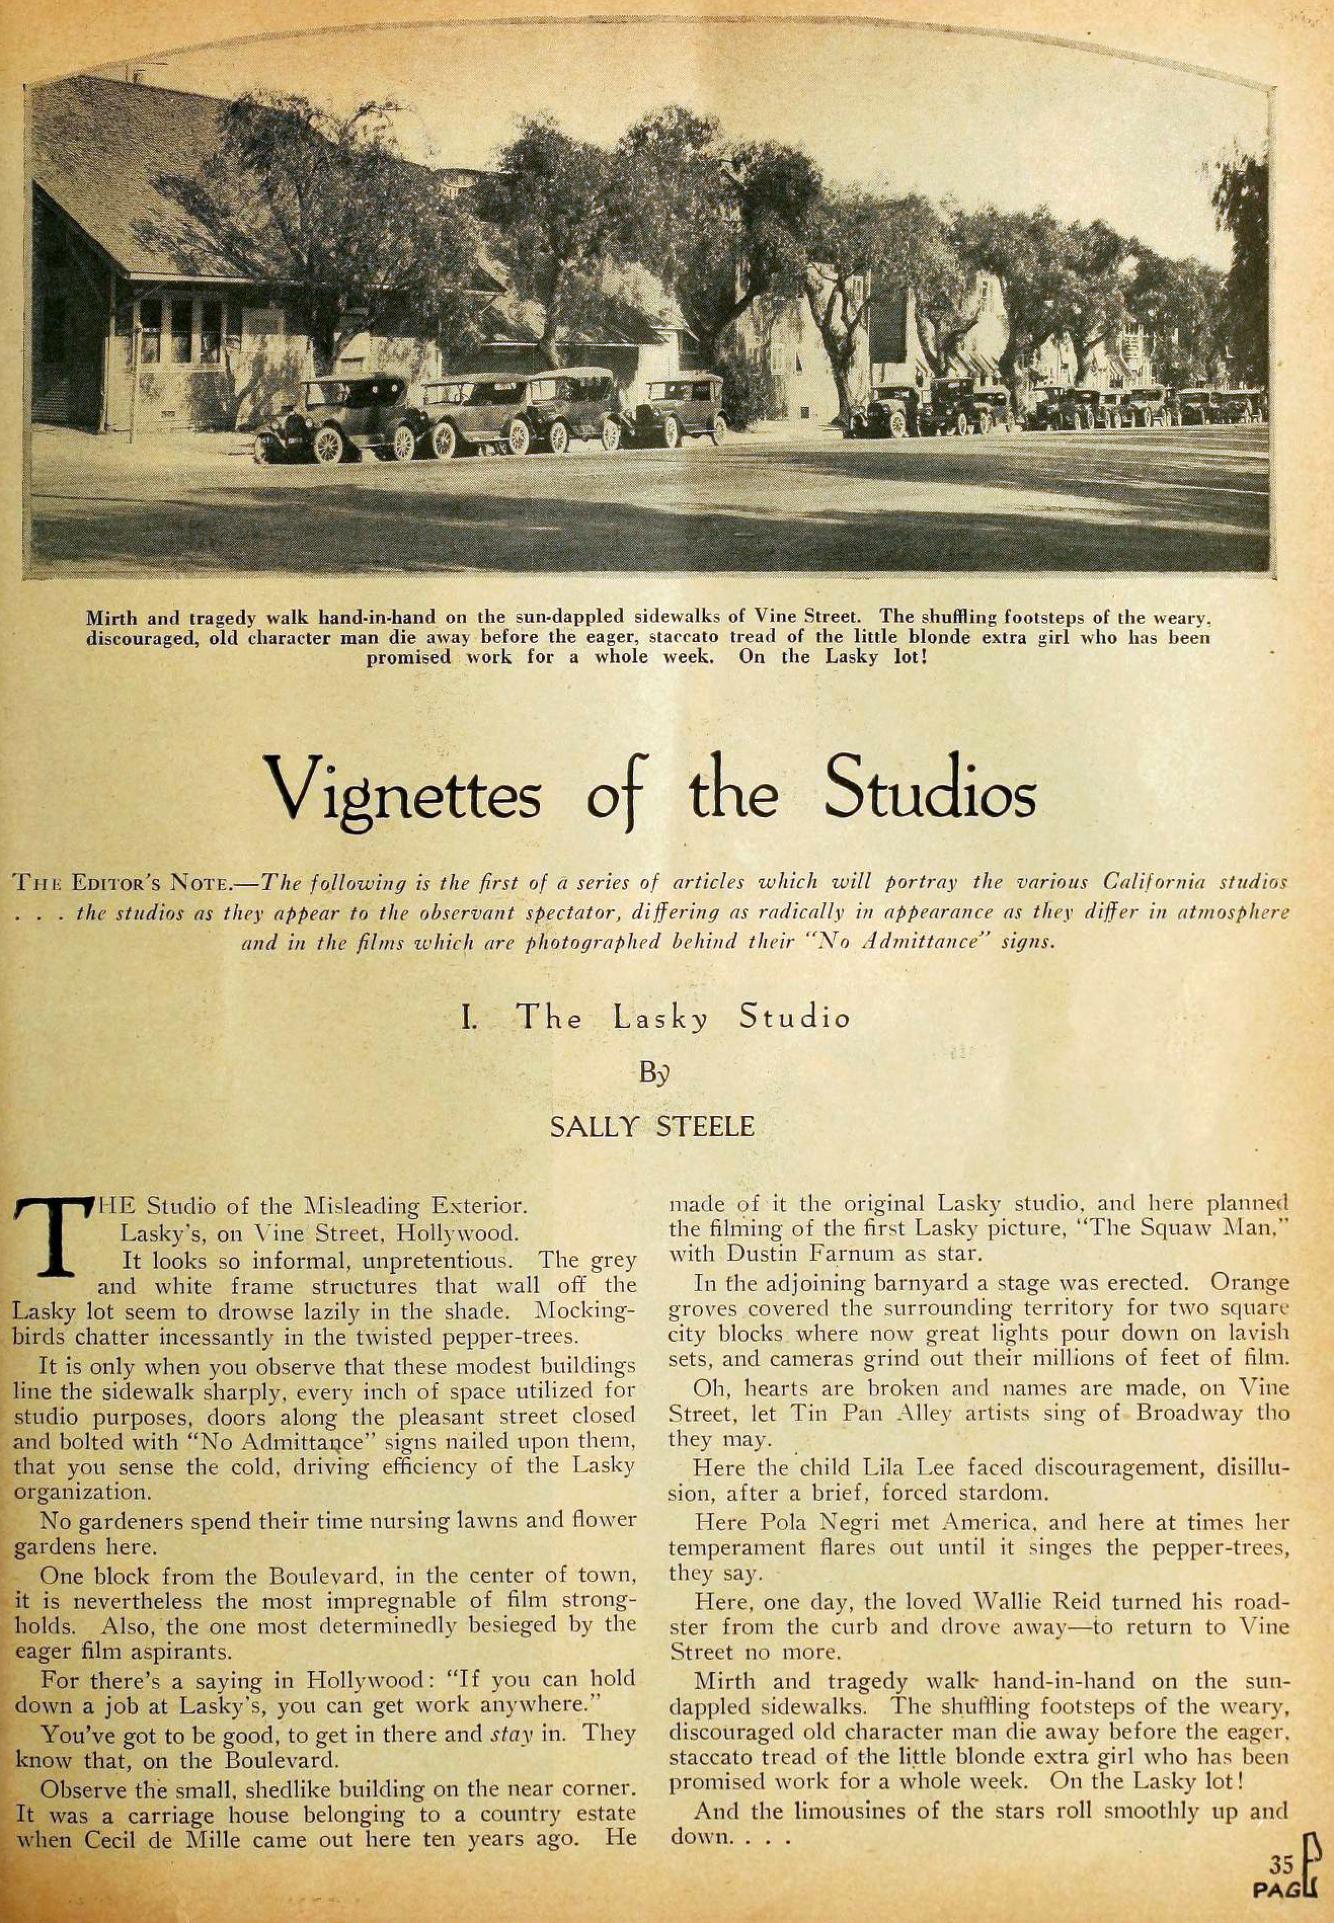 motion picture vignettes of the studios 01a lasky november 1923